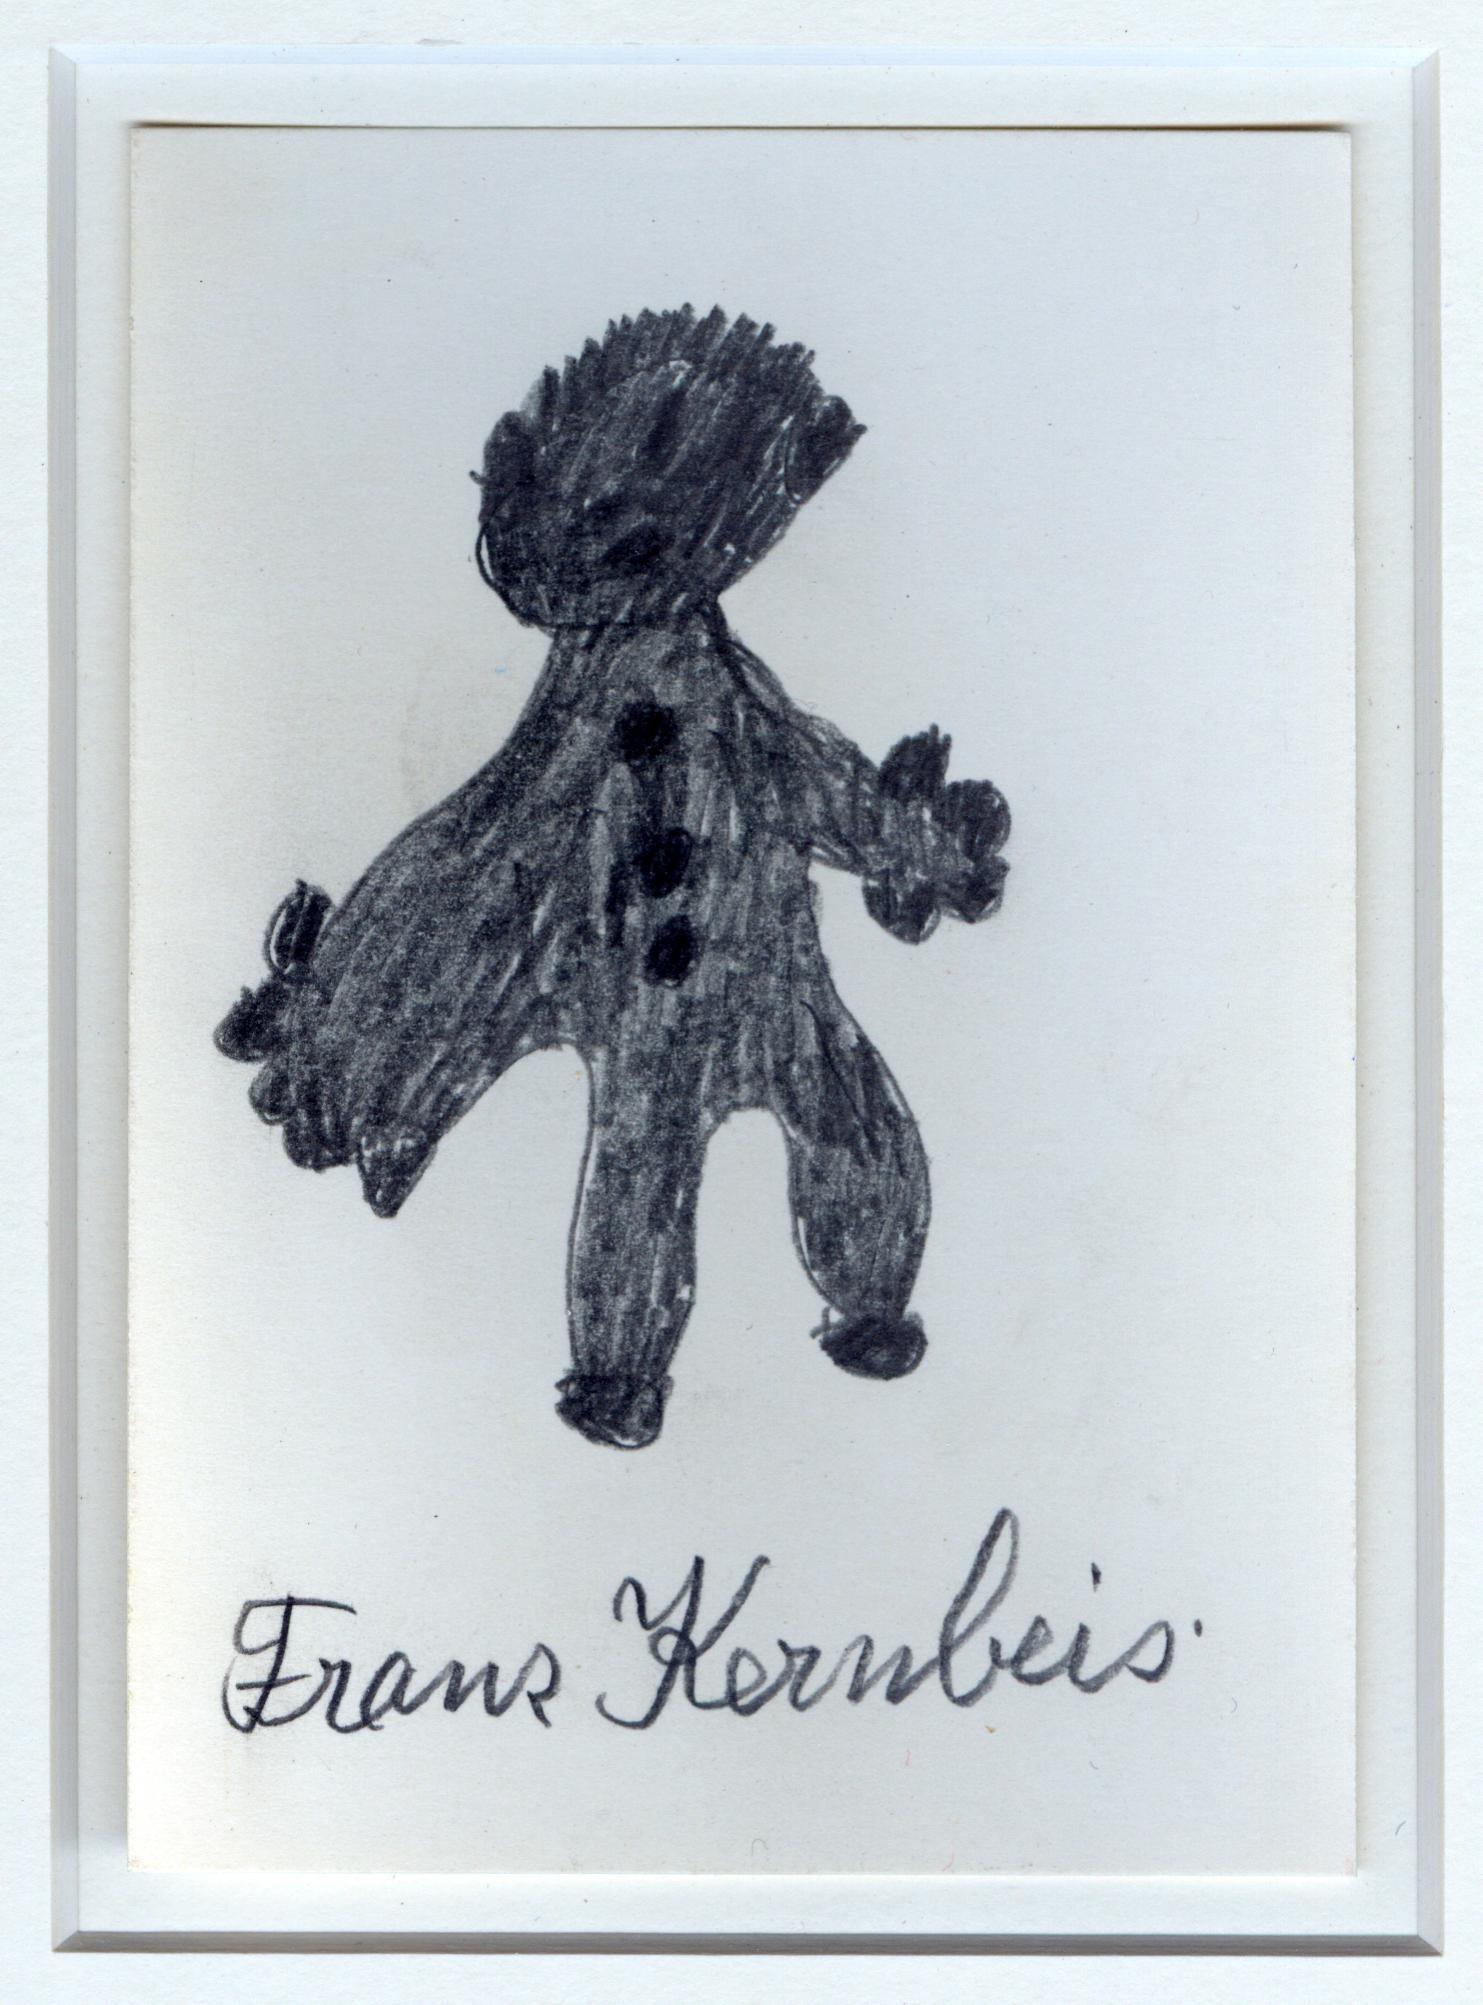 Kernbeis_1787